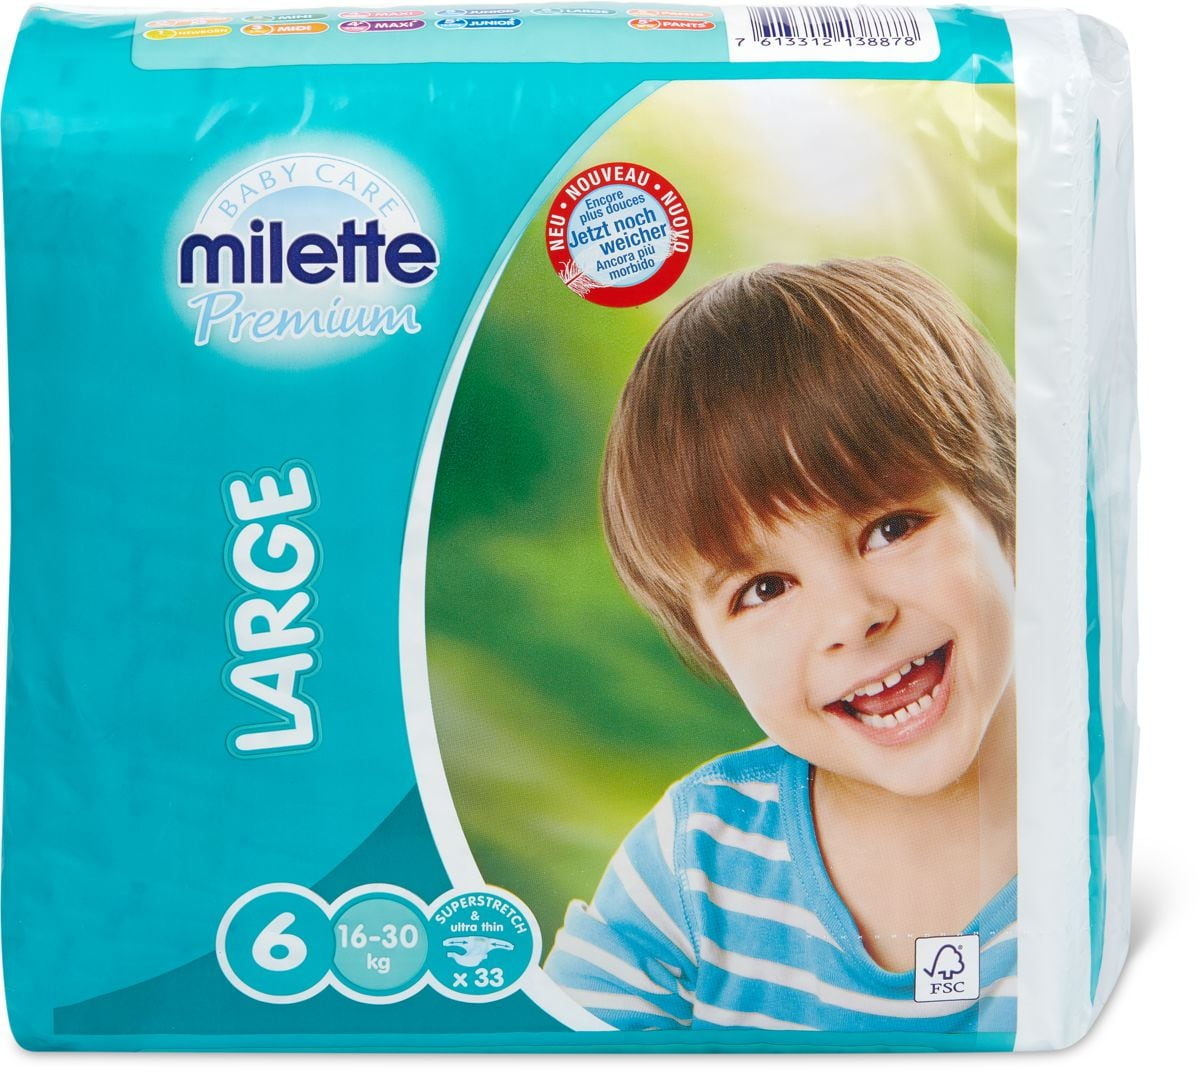 Milette Large 6, 16-30kg